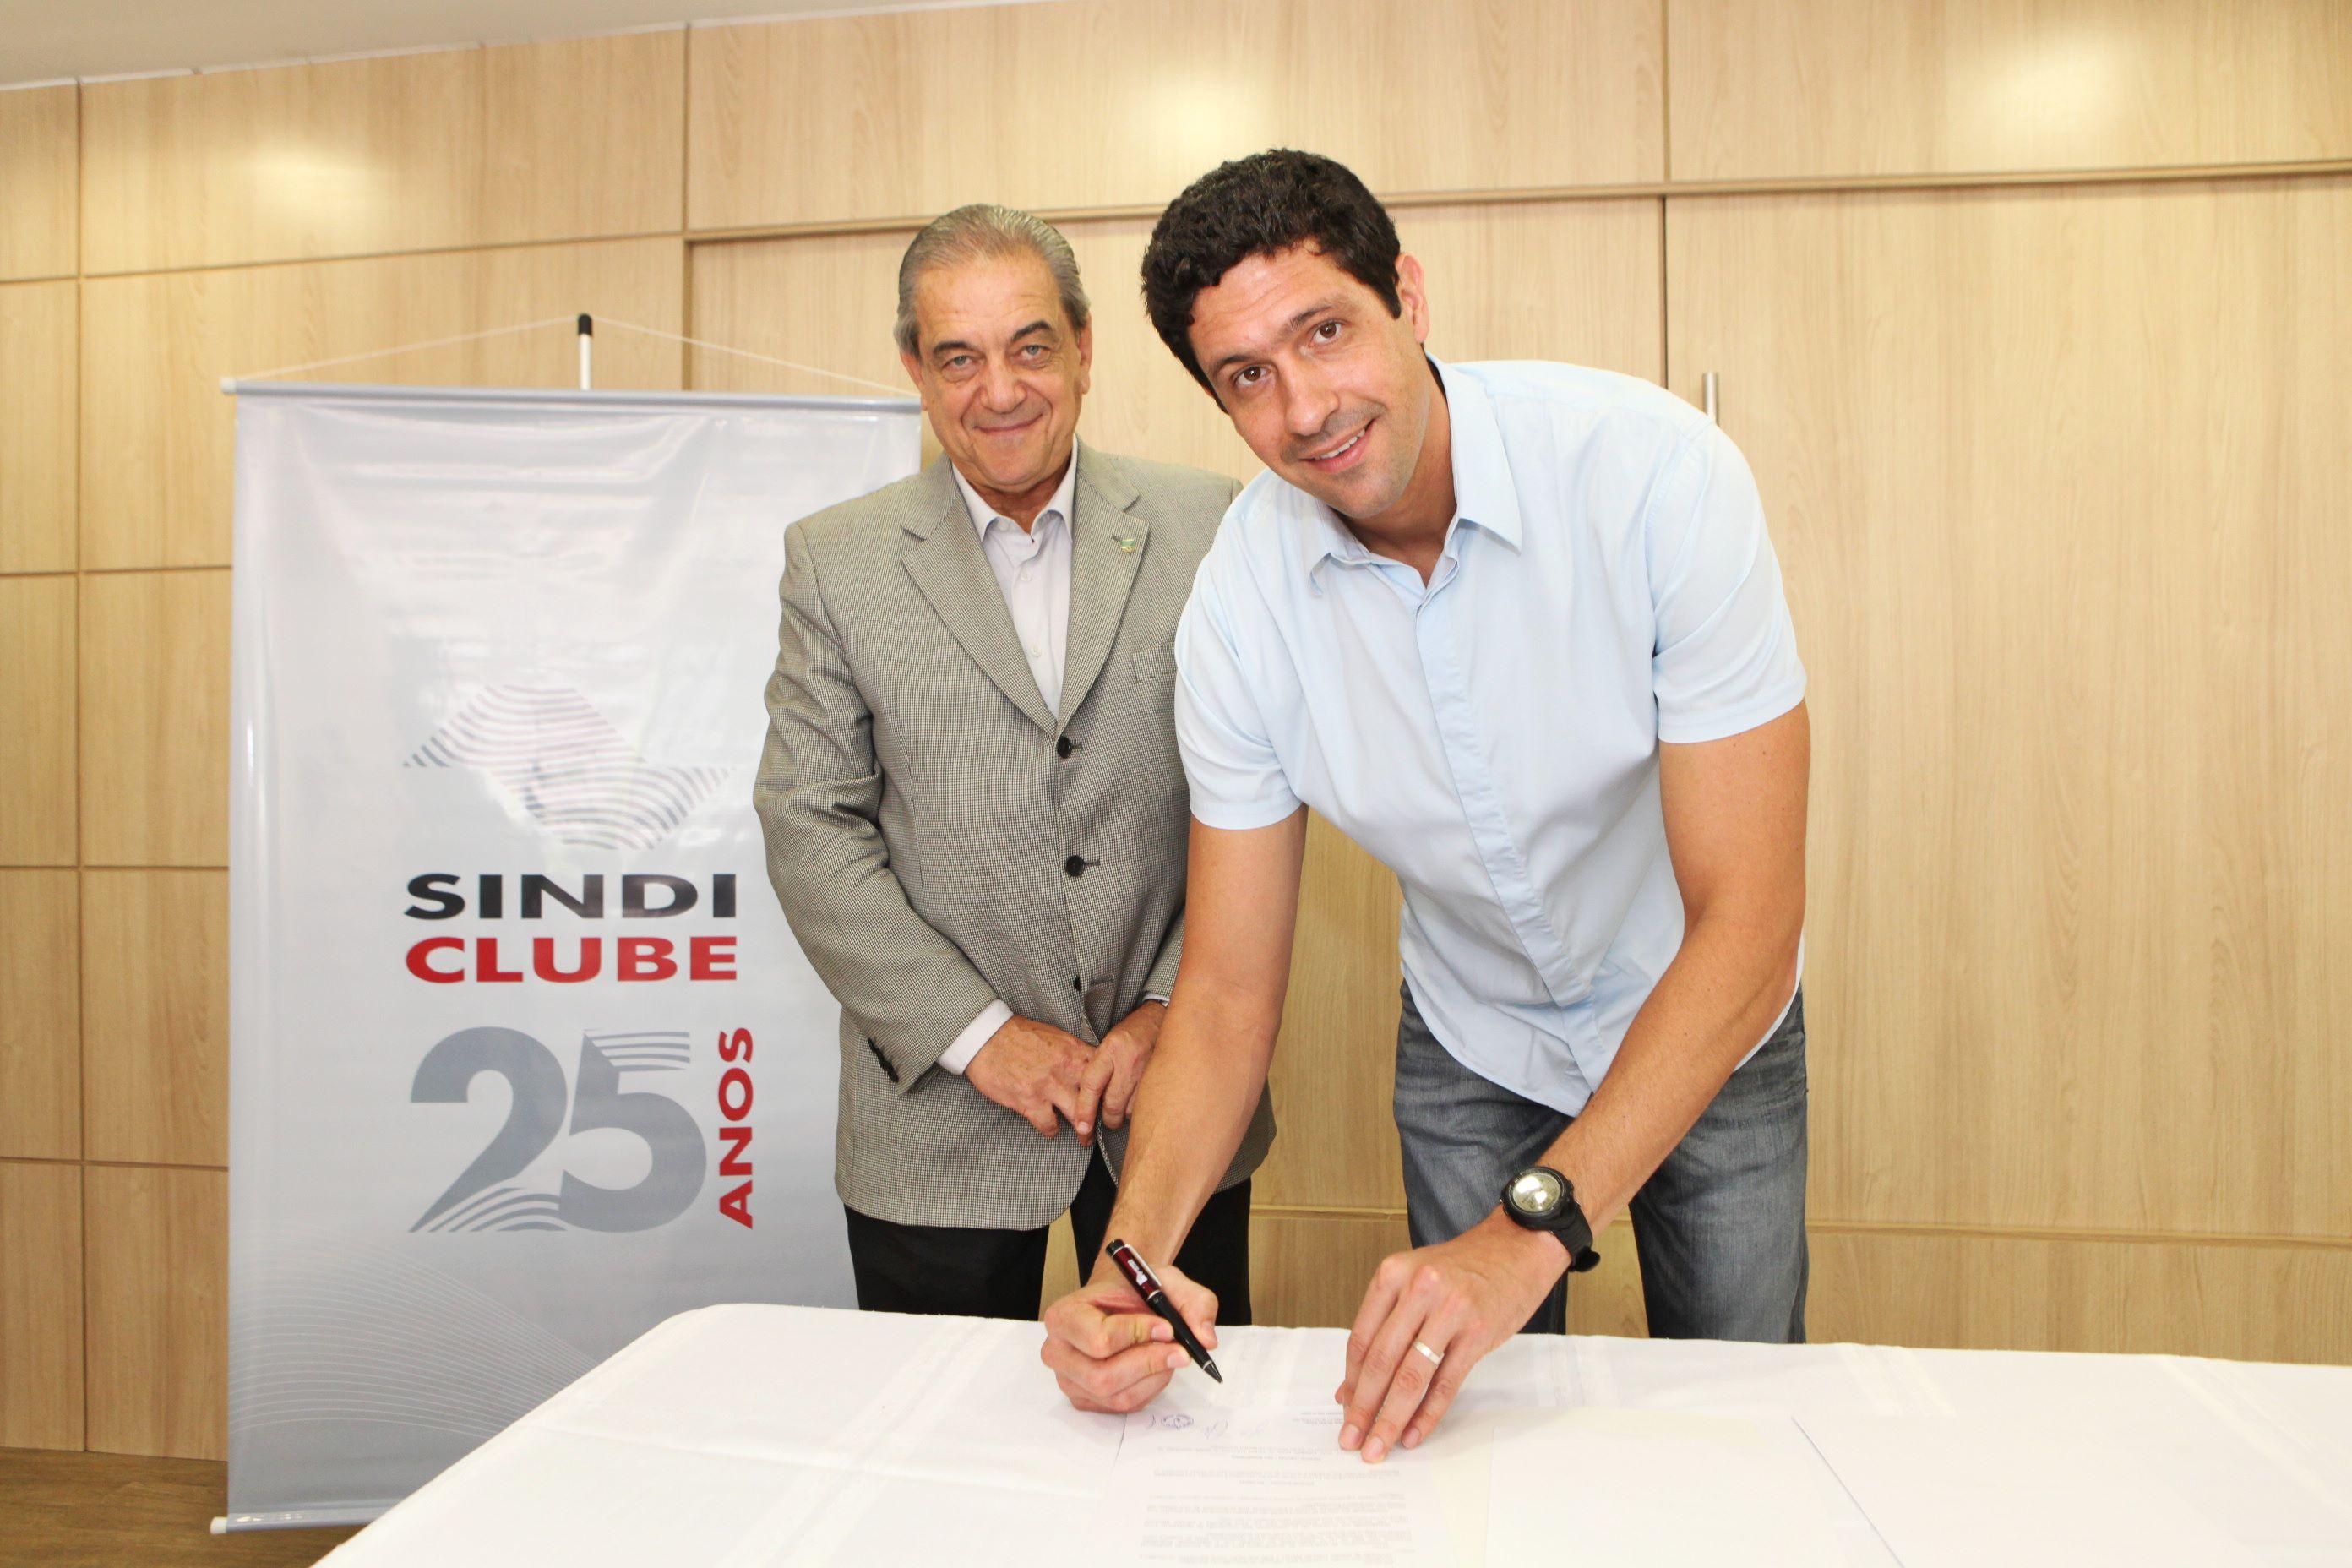 Presidente do Sindi-Clube, Cezar Roberto Leão Granieri, e Gustavo Borges assinam convênio